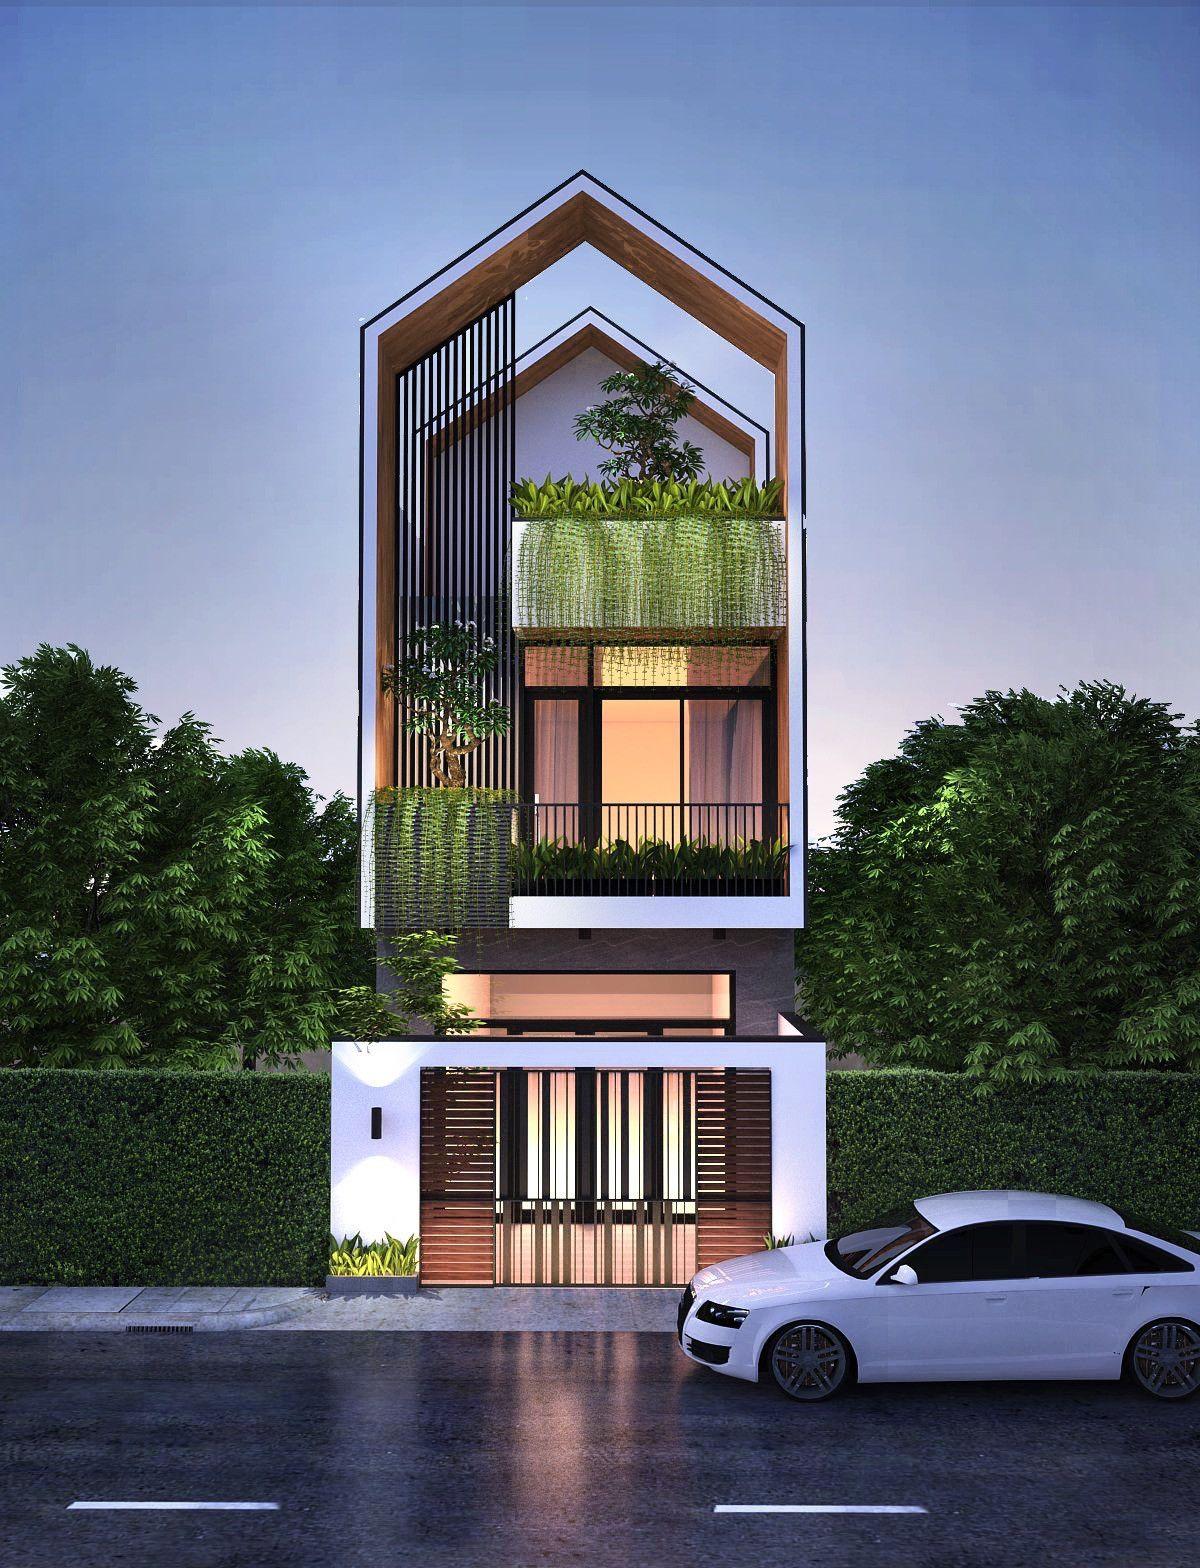 Small Lot Home Designs 2020 Narrow House Designs House Designs Exterior Narrow Lot House